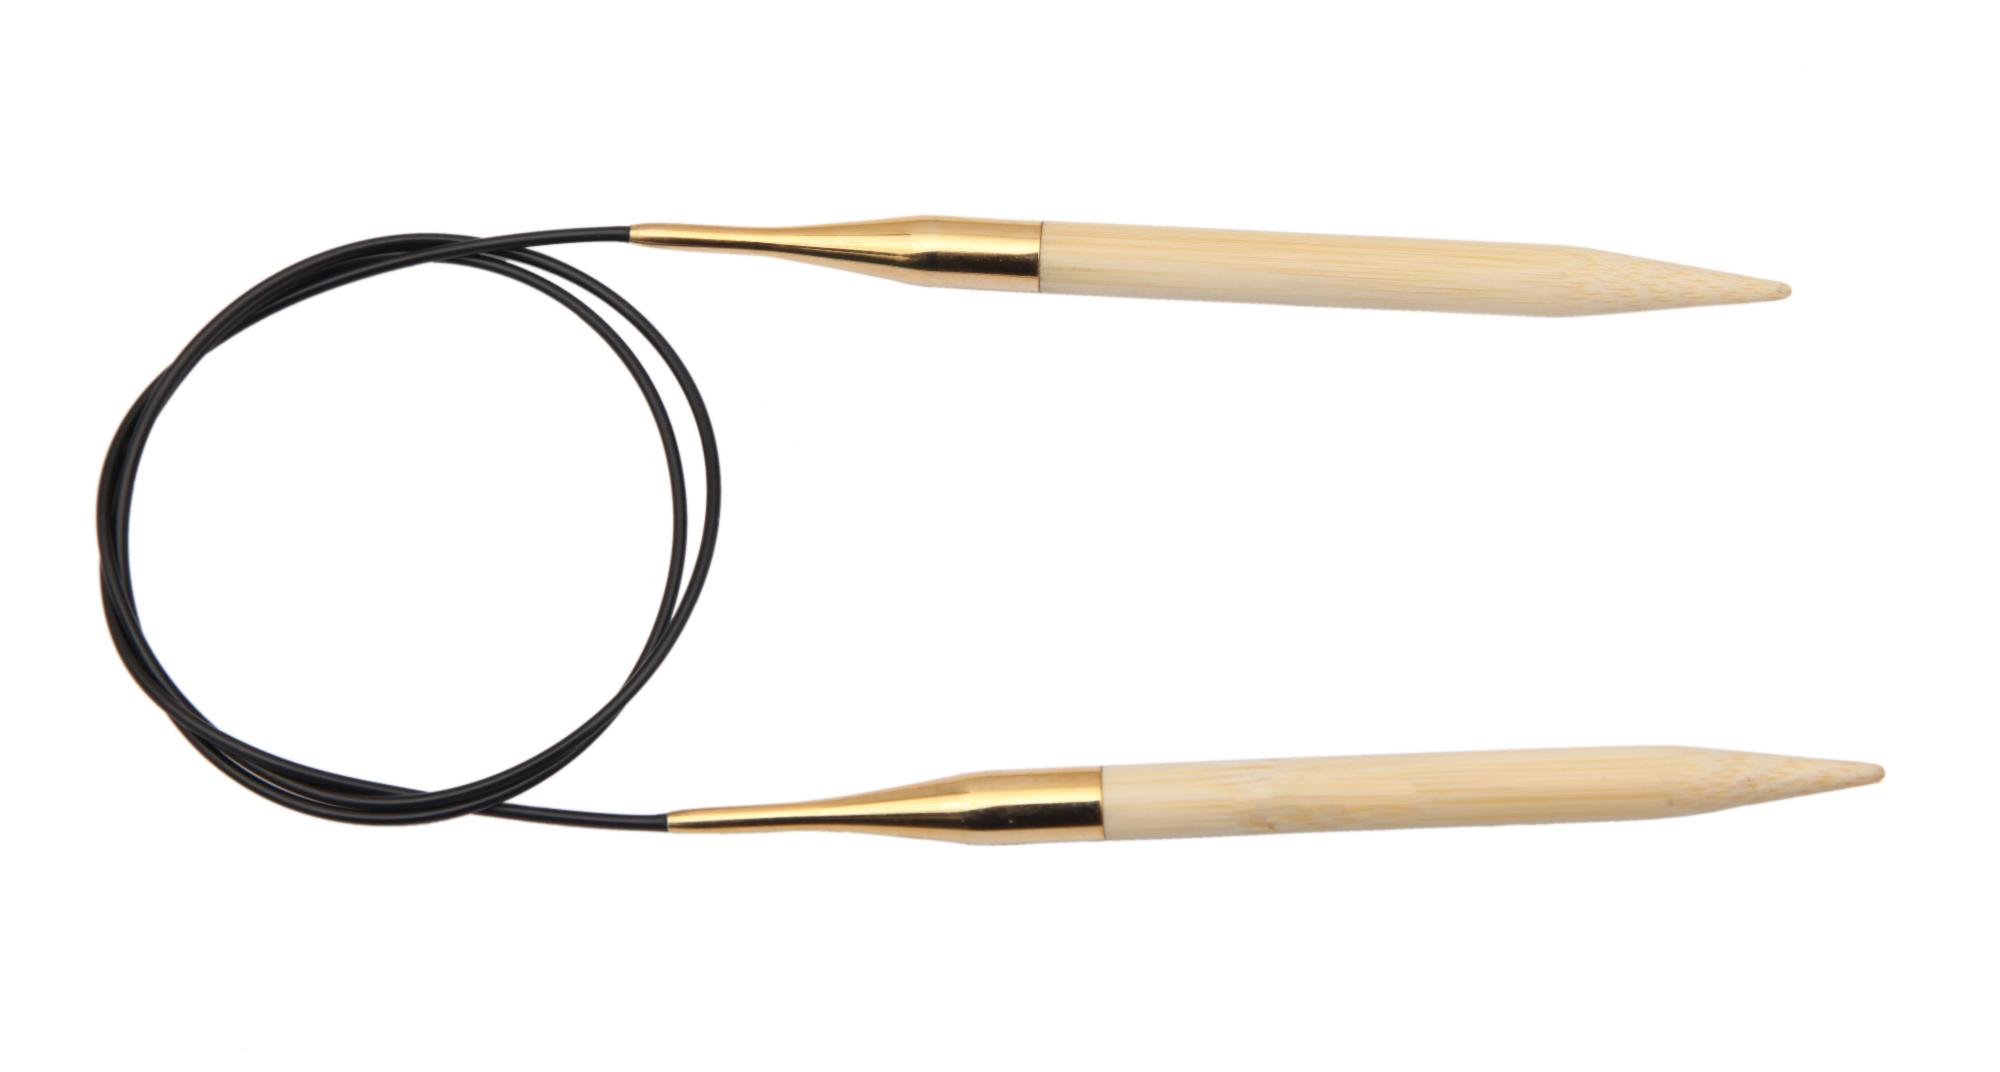 Спицы круговые 100 см Bamboo KnitPro, 22268, 4.50 мм